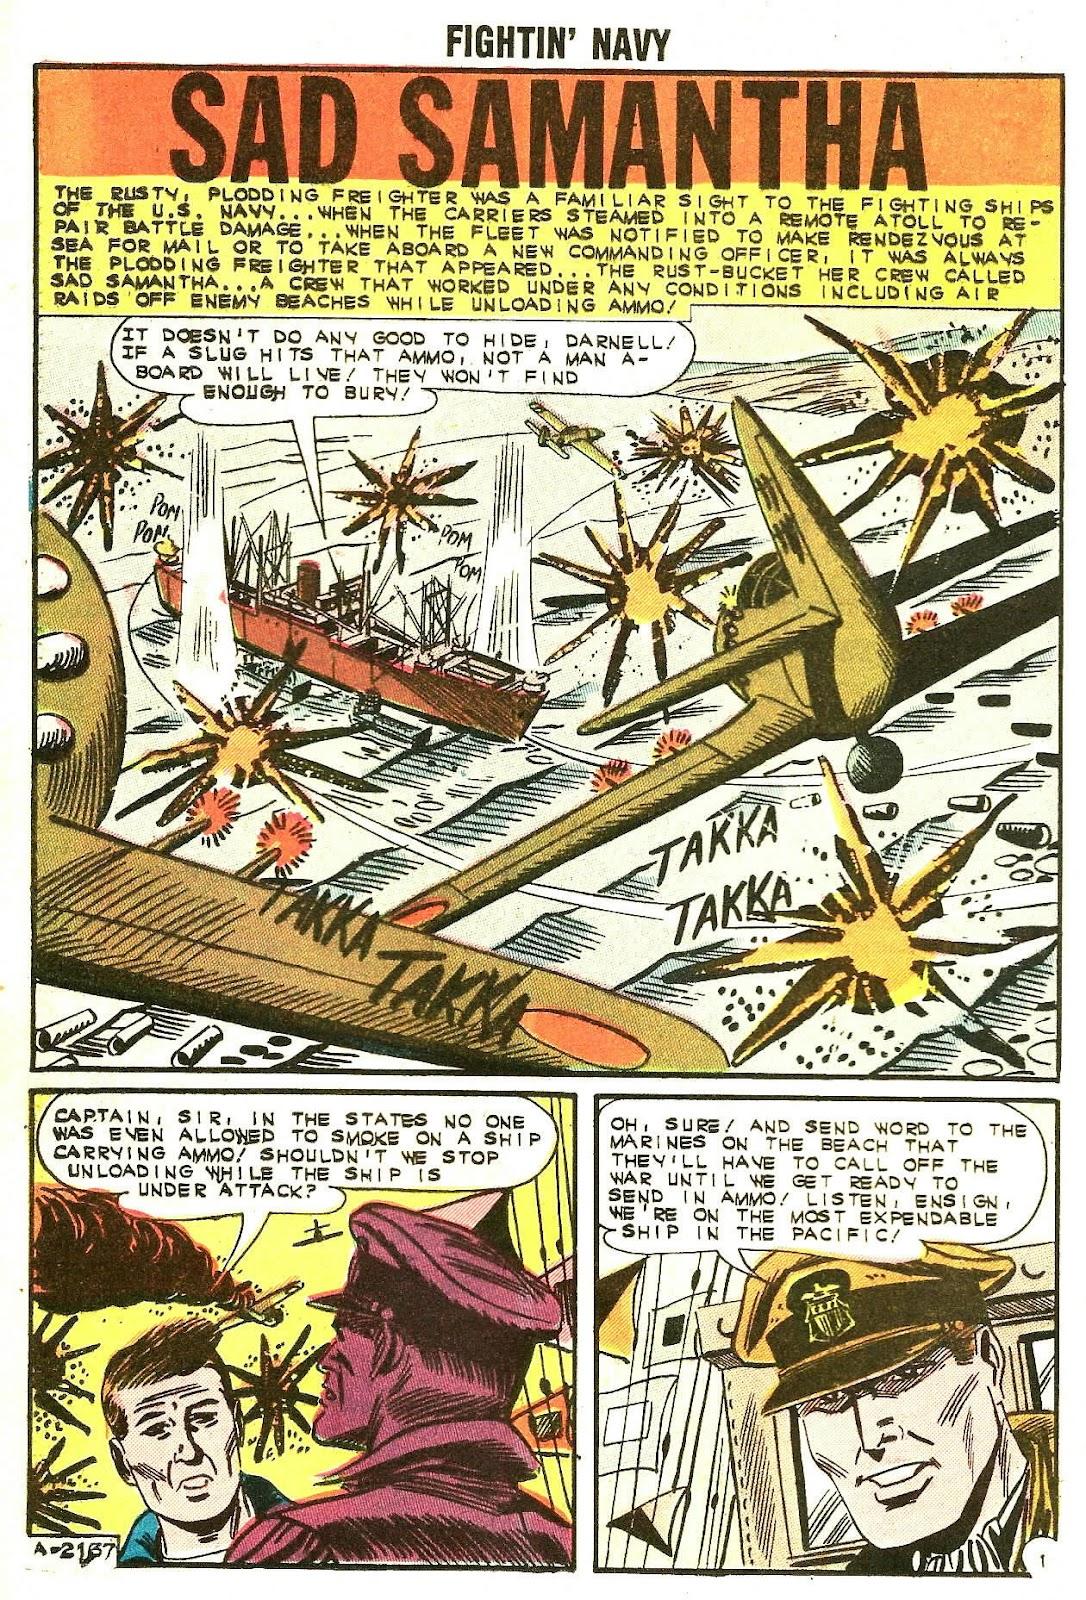 Read online Fightin' Navy comic -  Issue #107 - 20